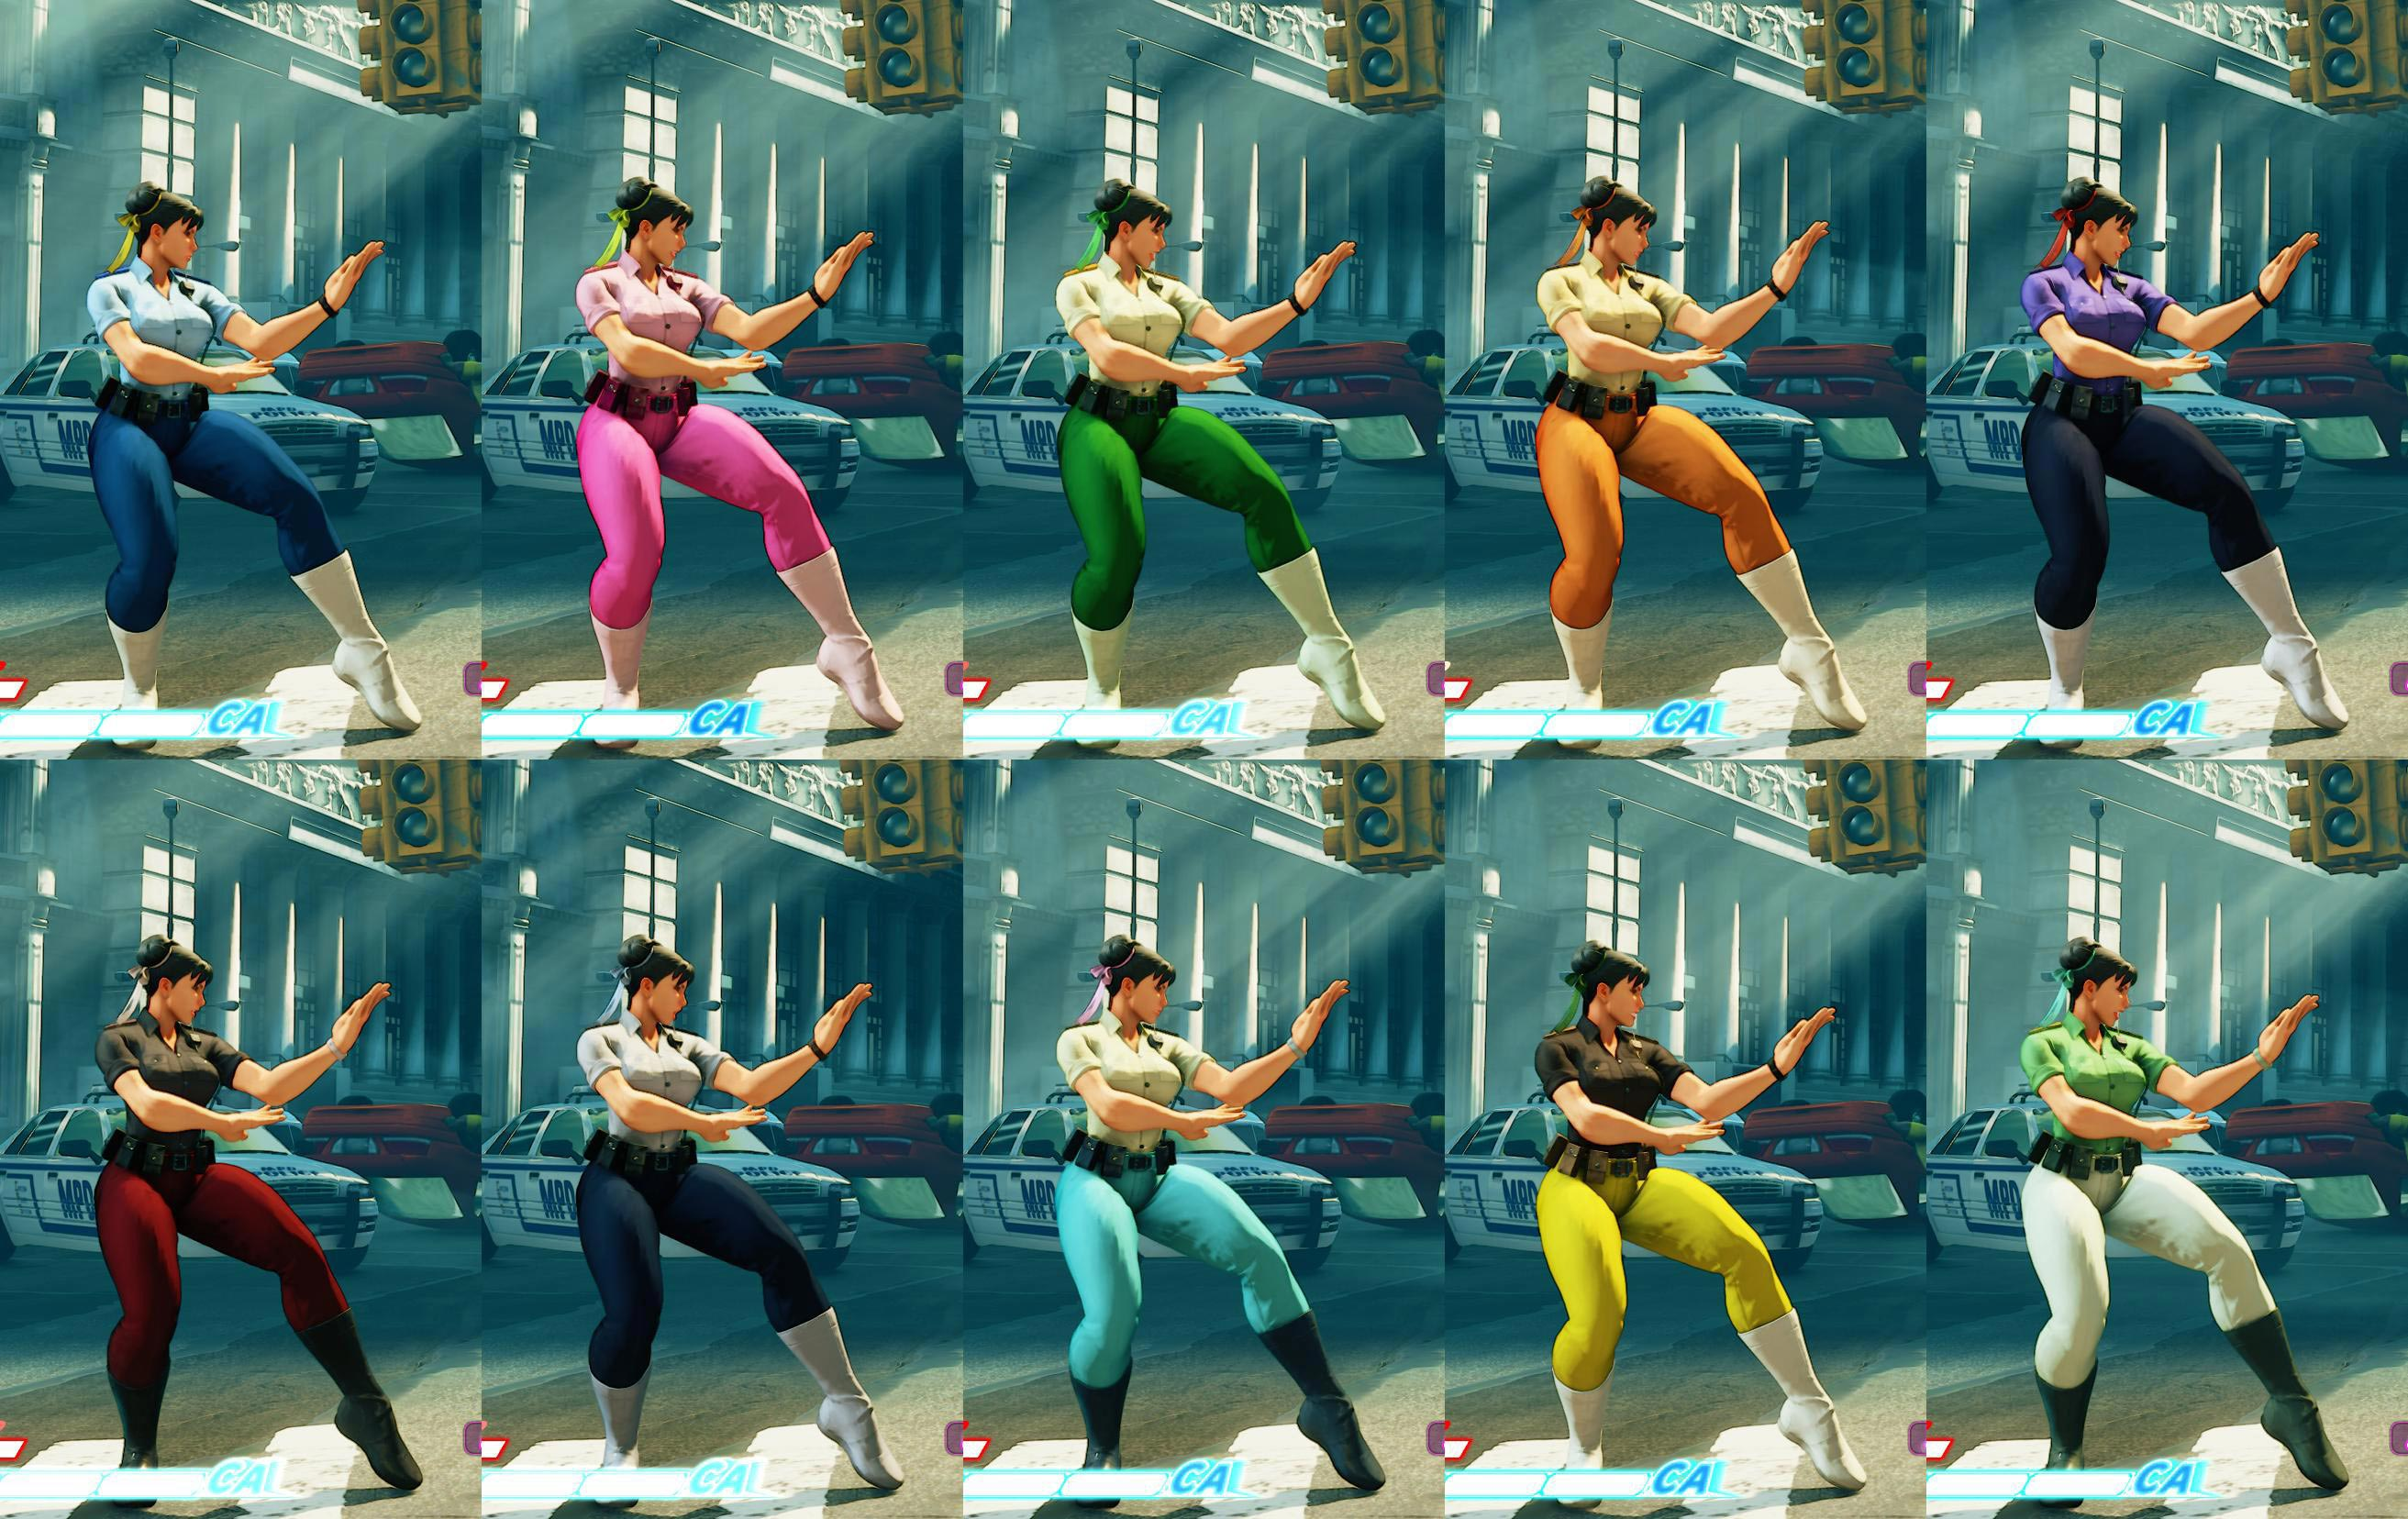 Chun-Li's Street Fighter 5 wardrobe 2 out of 13 image gallery